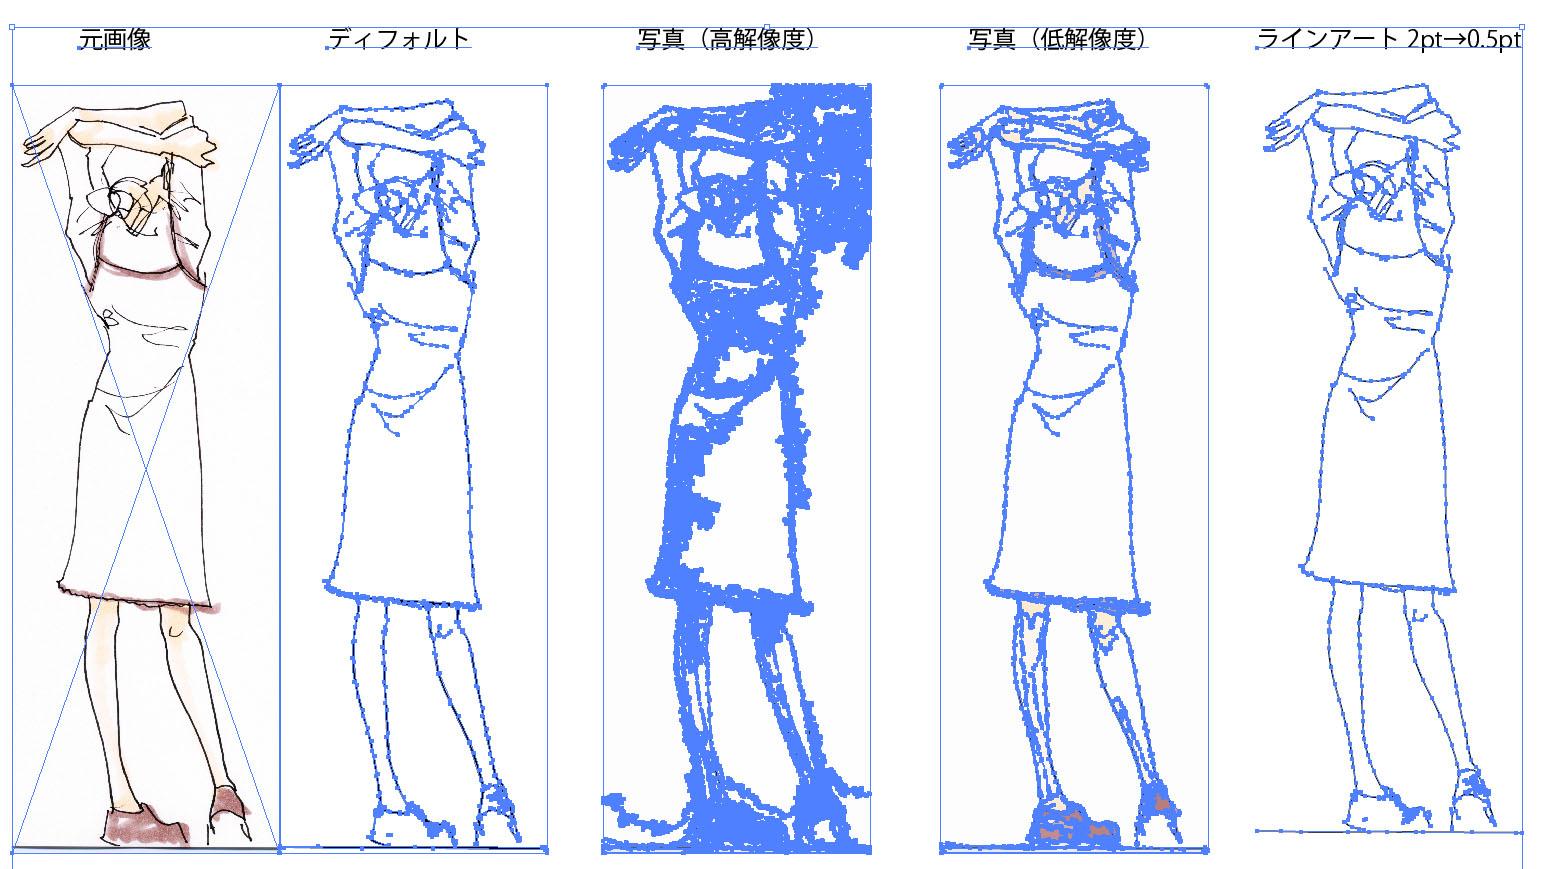 IllustratorCS6 トレース結果(アウトライン)